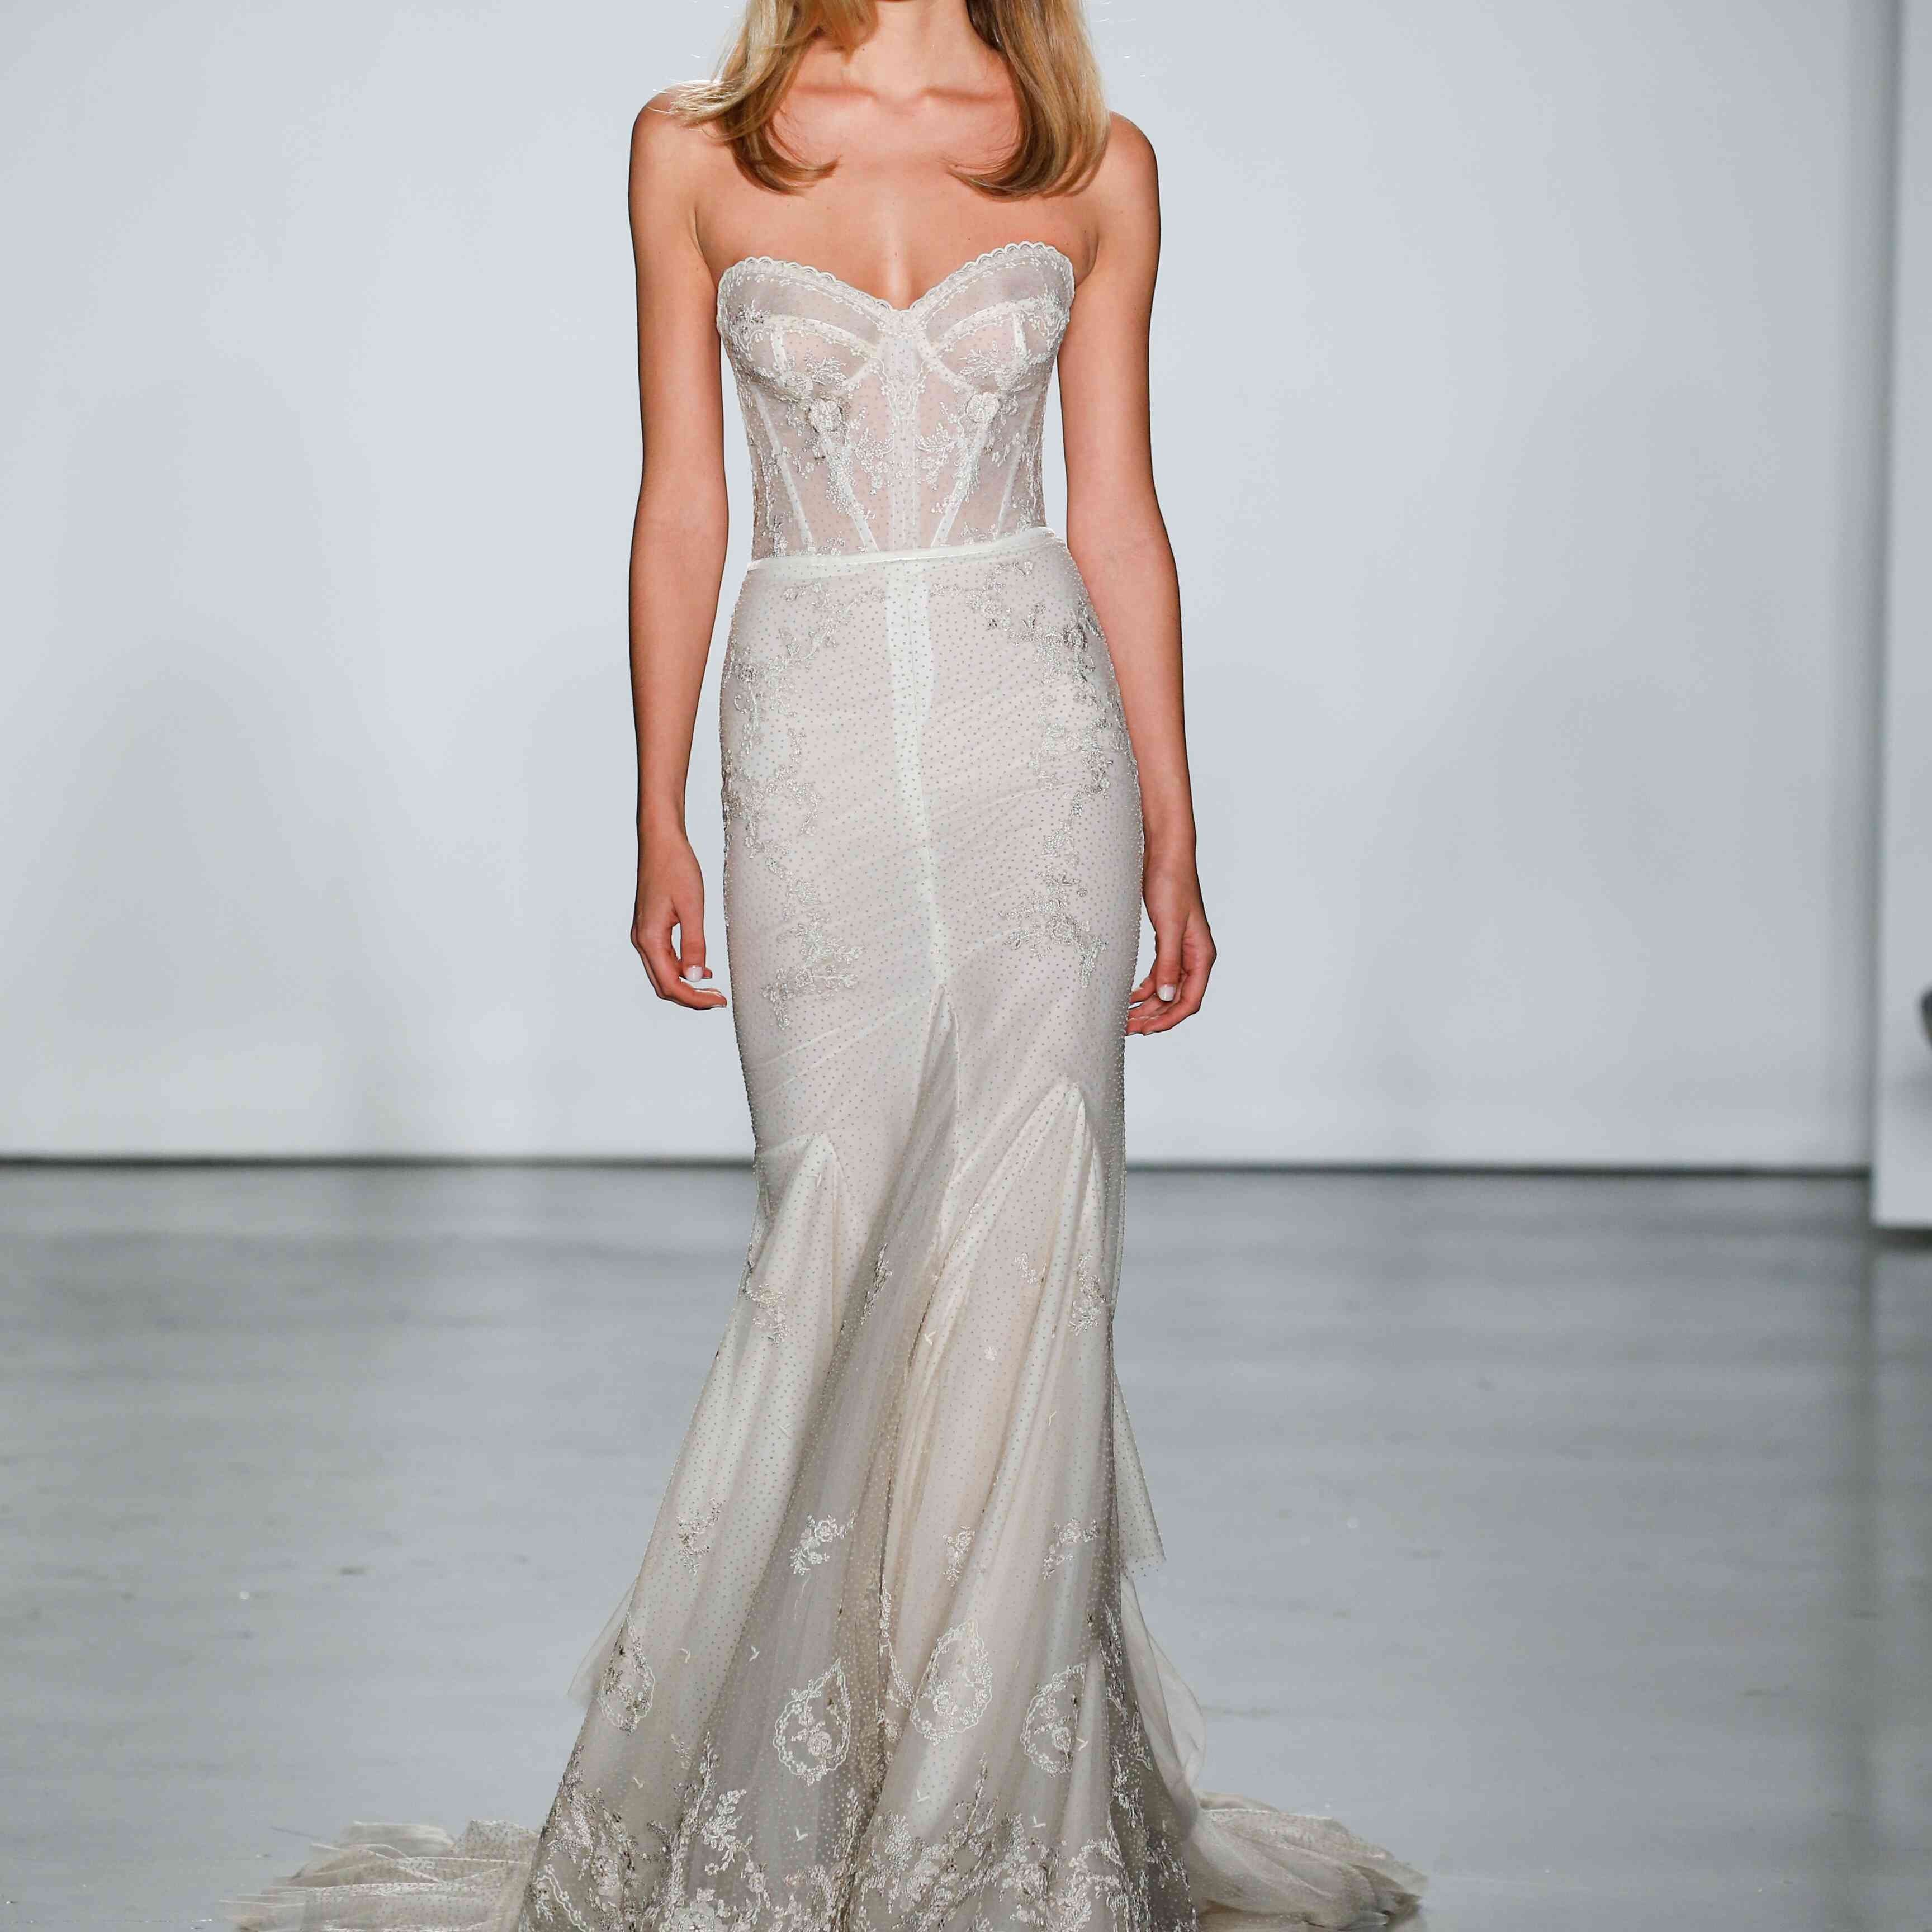 Model in vintage Inbal Dror VIP wedding dress